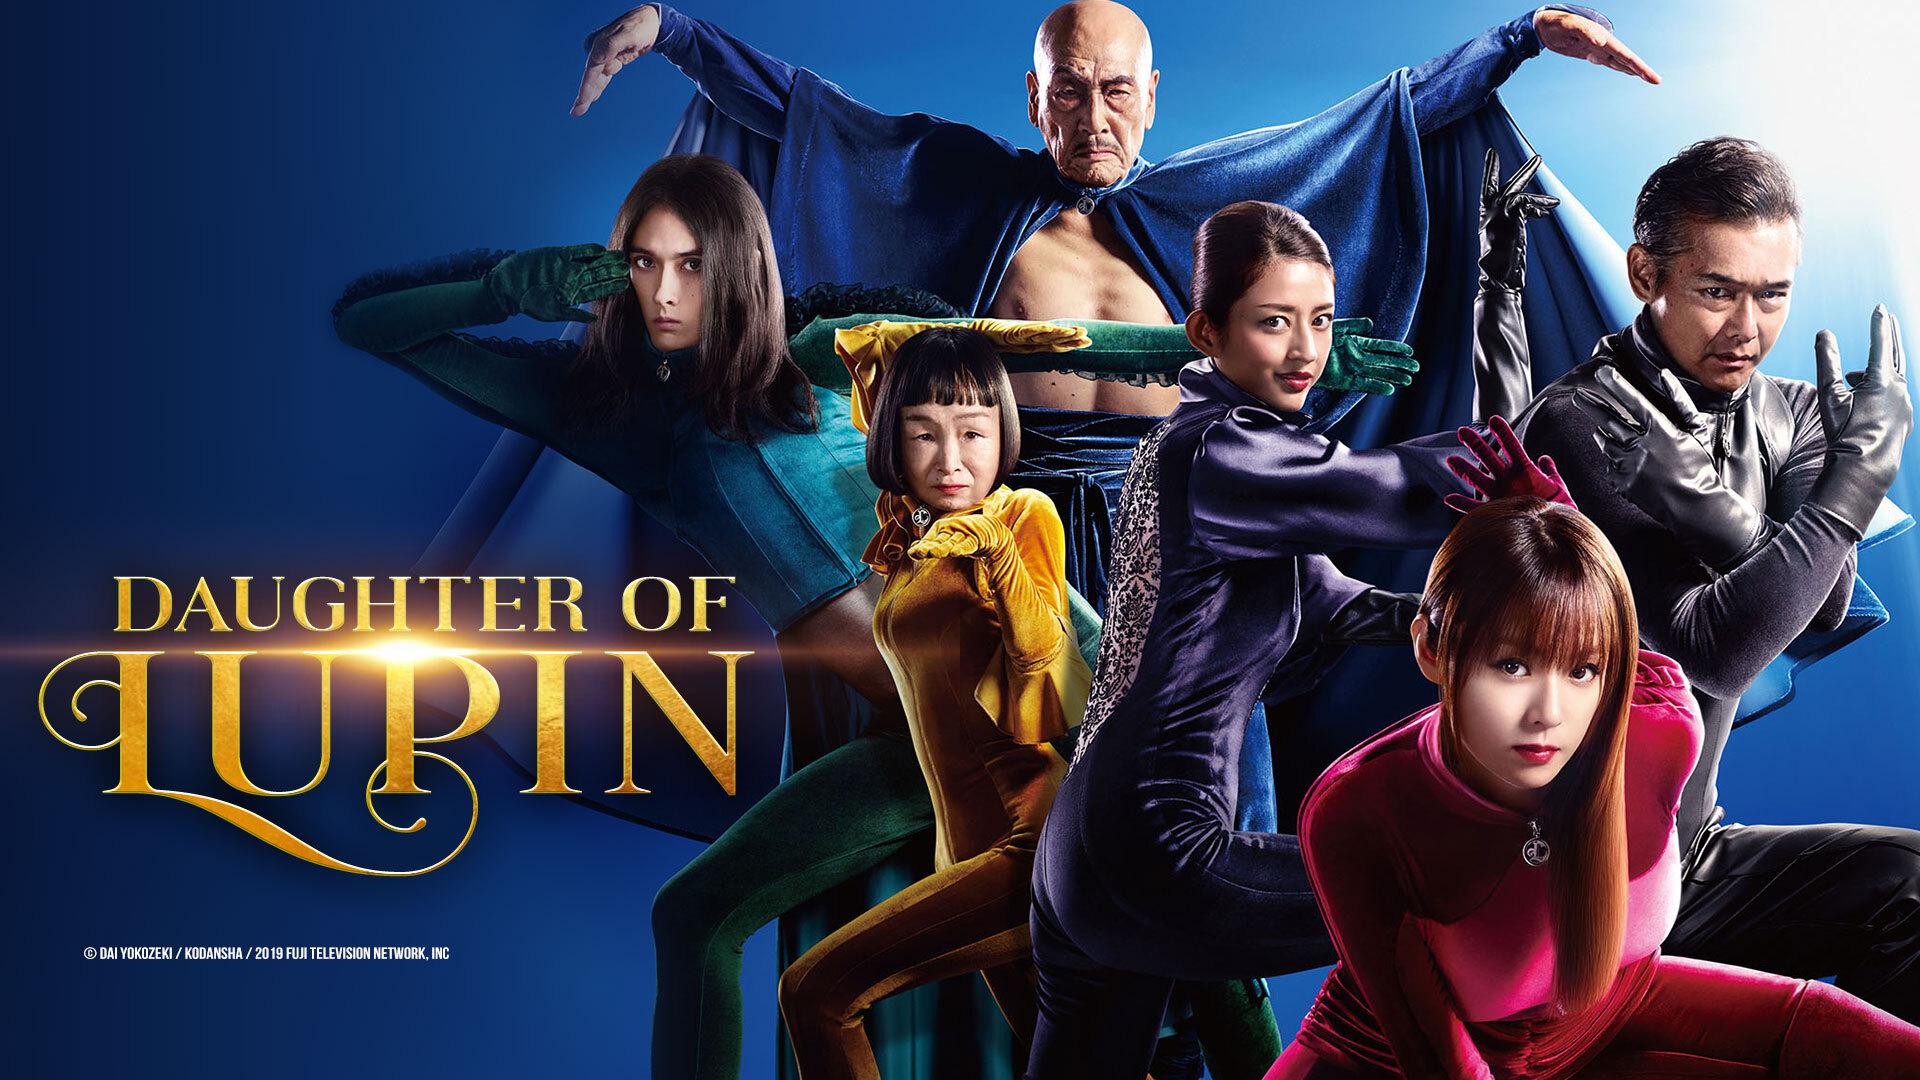 Daughter of Lupin